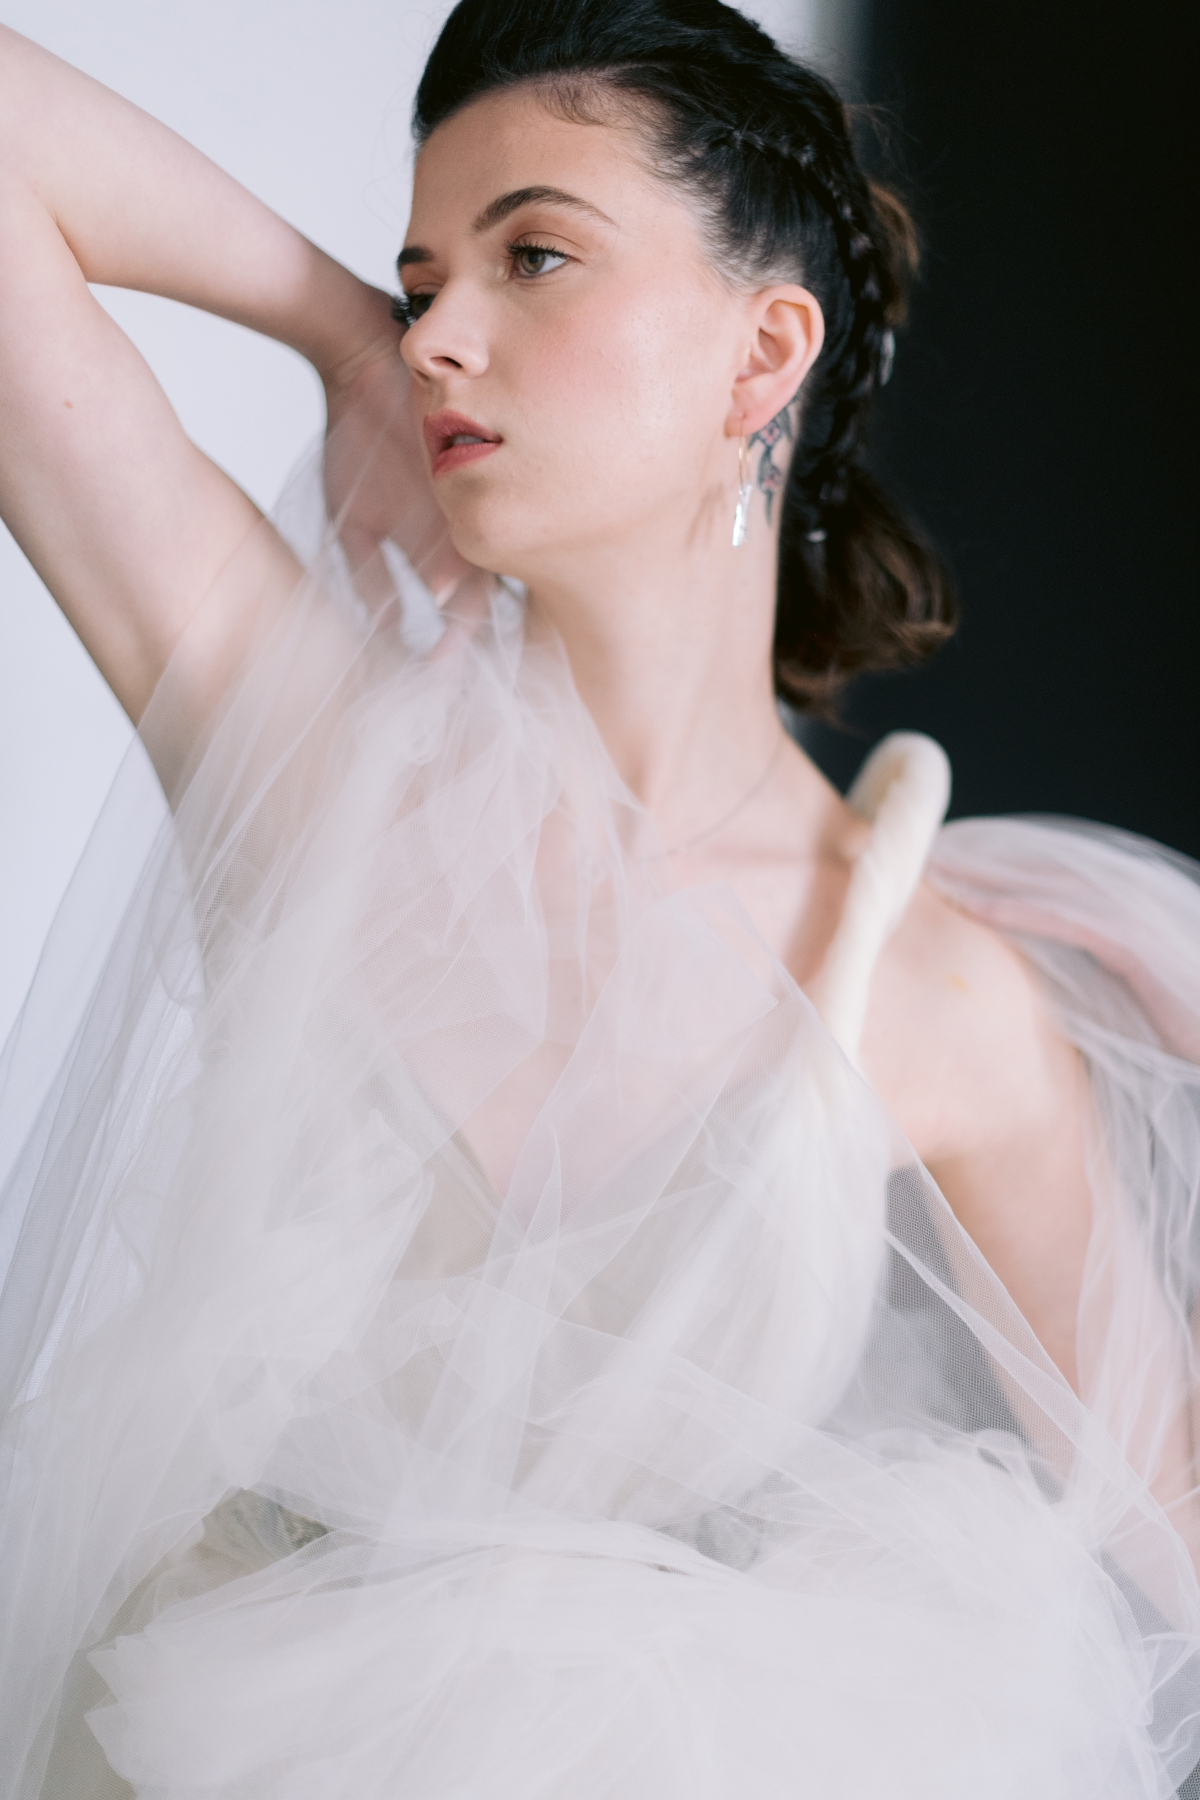 Laura Lanzerotte Bridal Danielle Heinson Photography 74